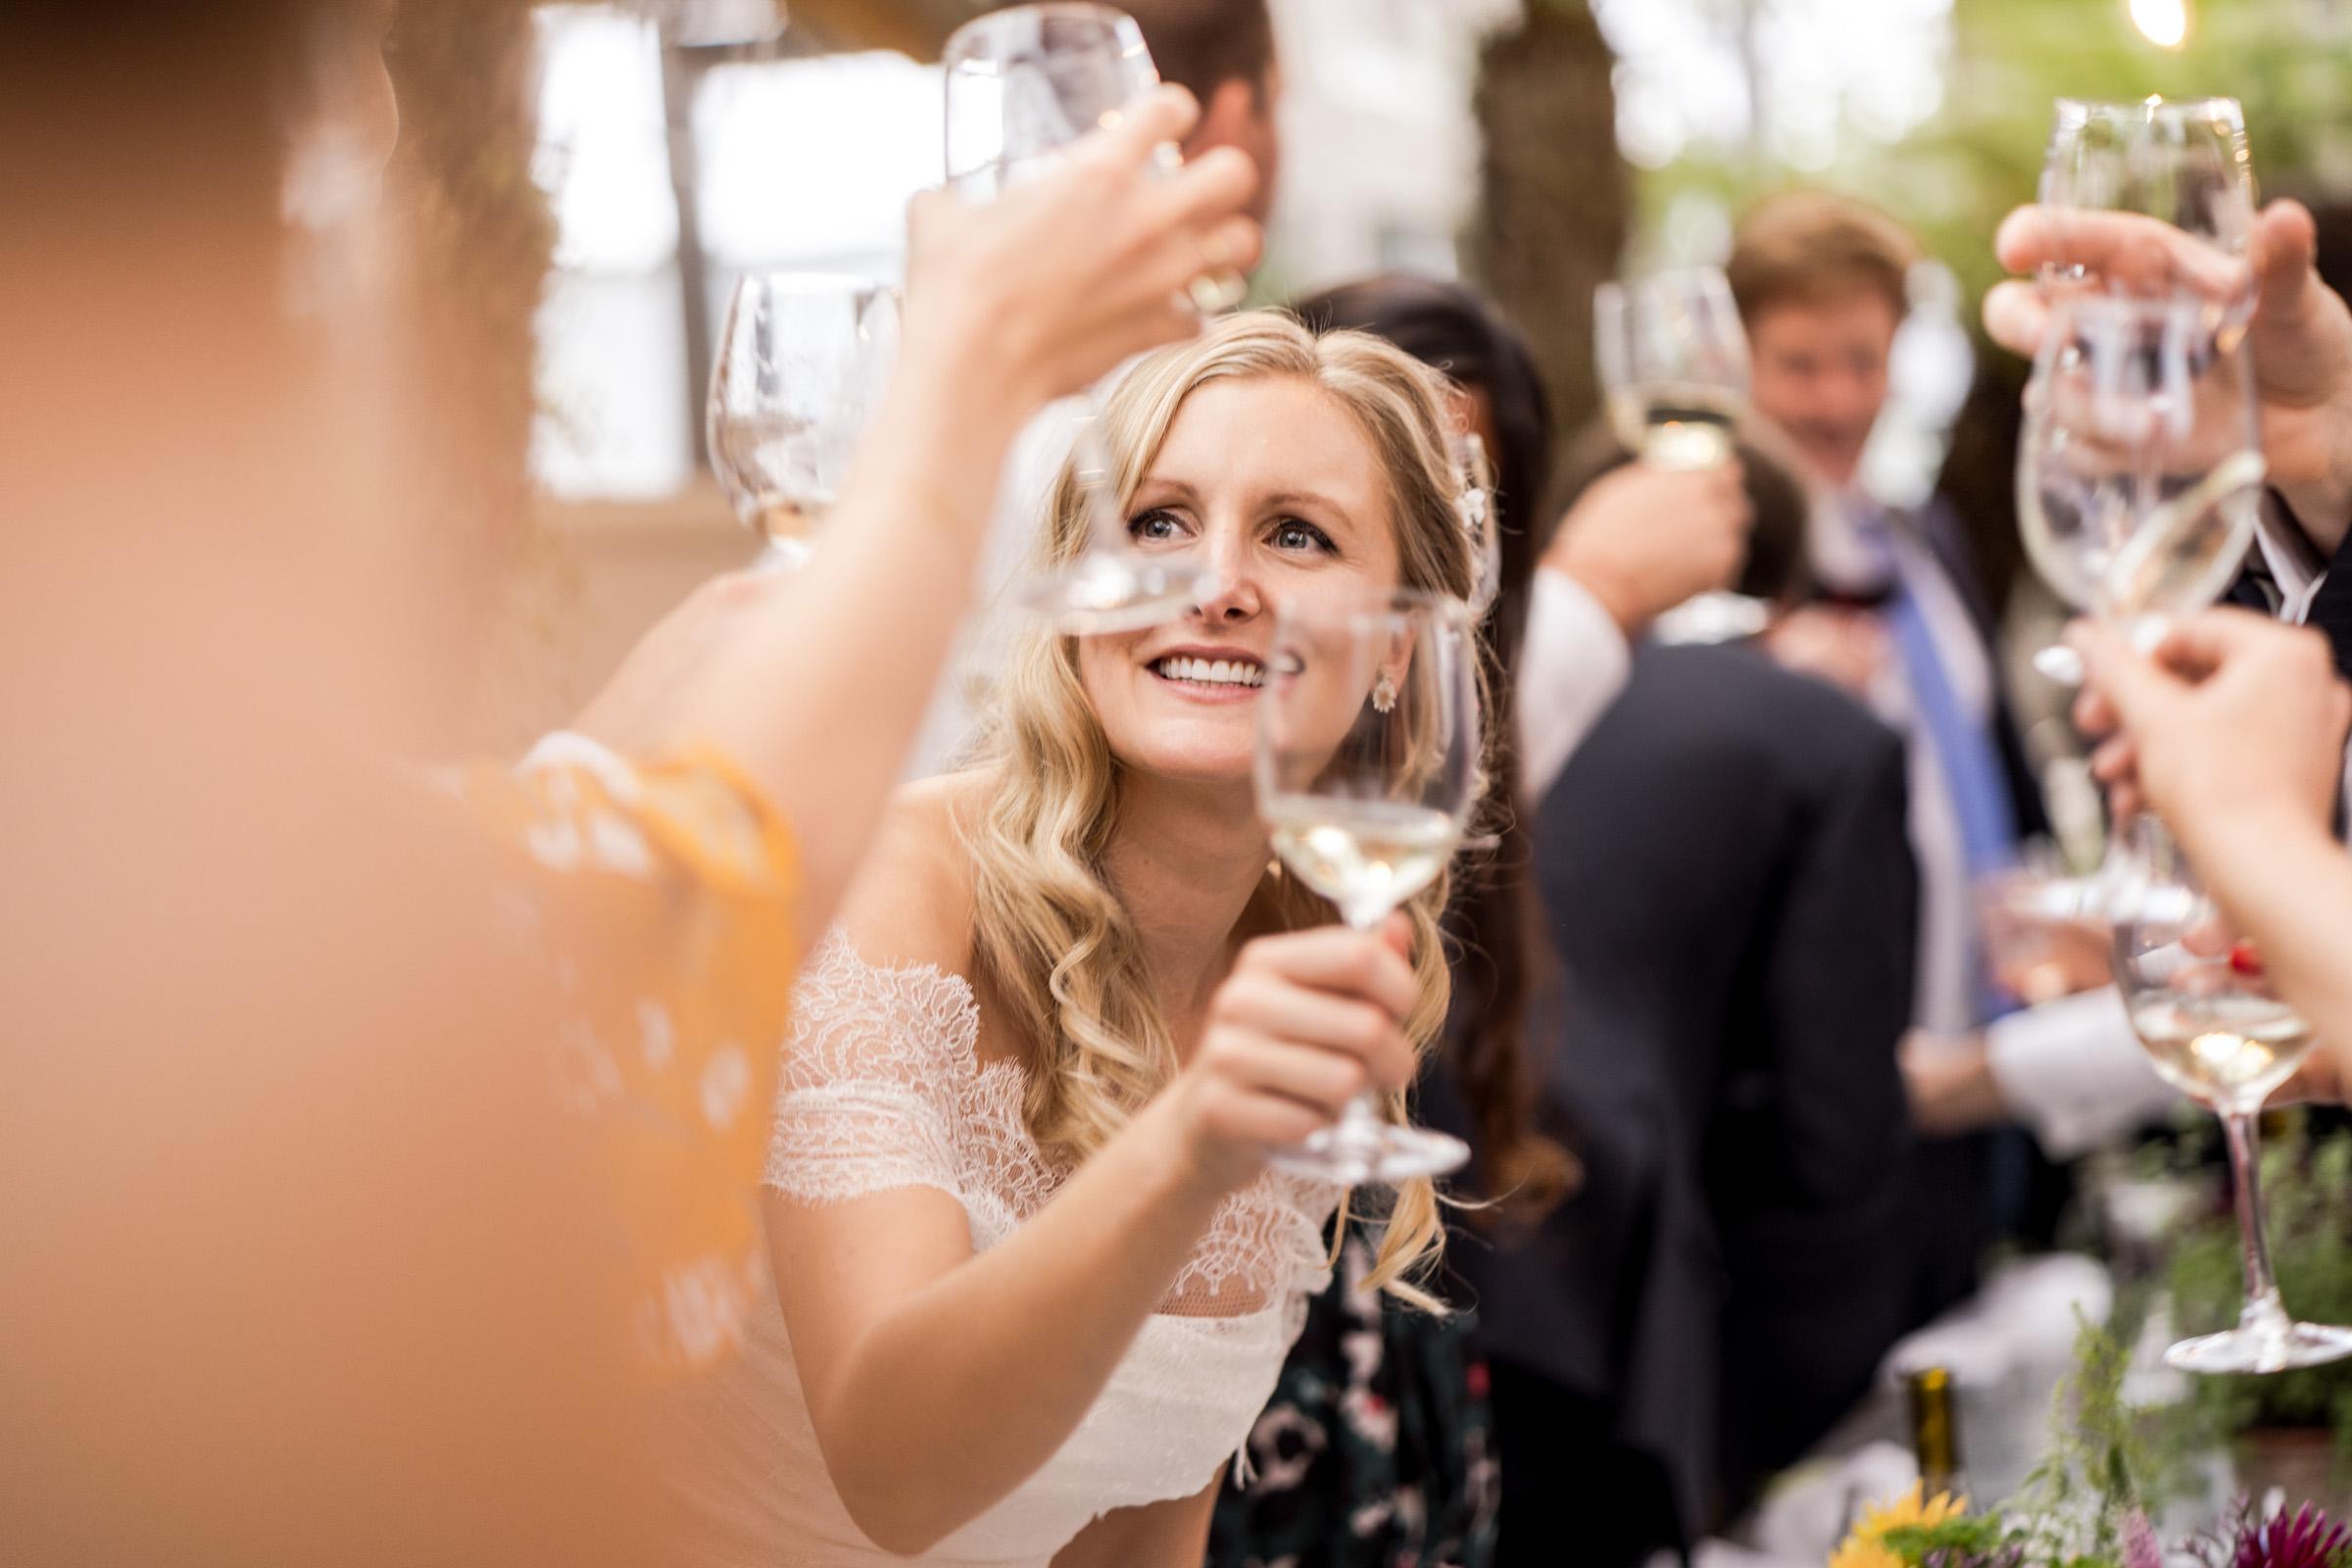 barbican london wedding photography 017.jpg